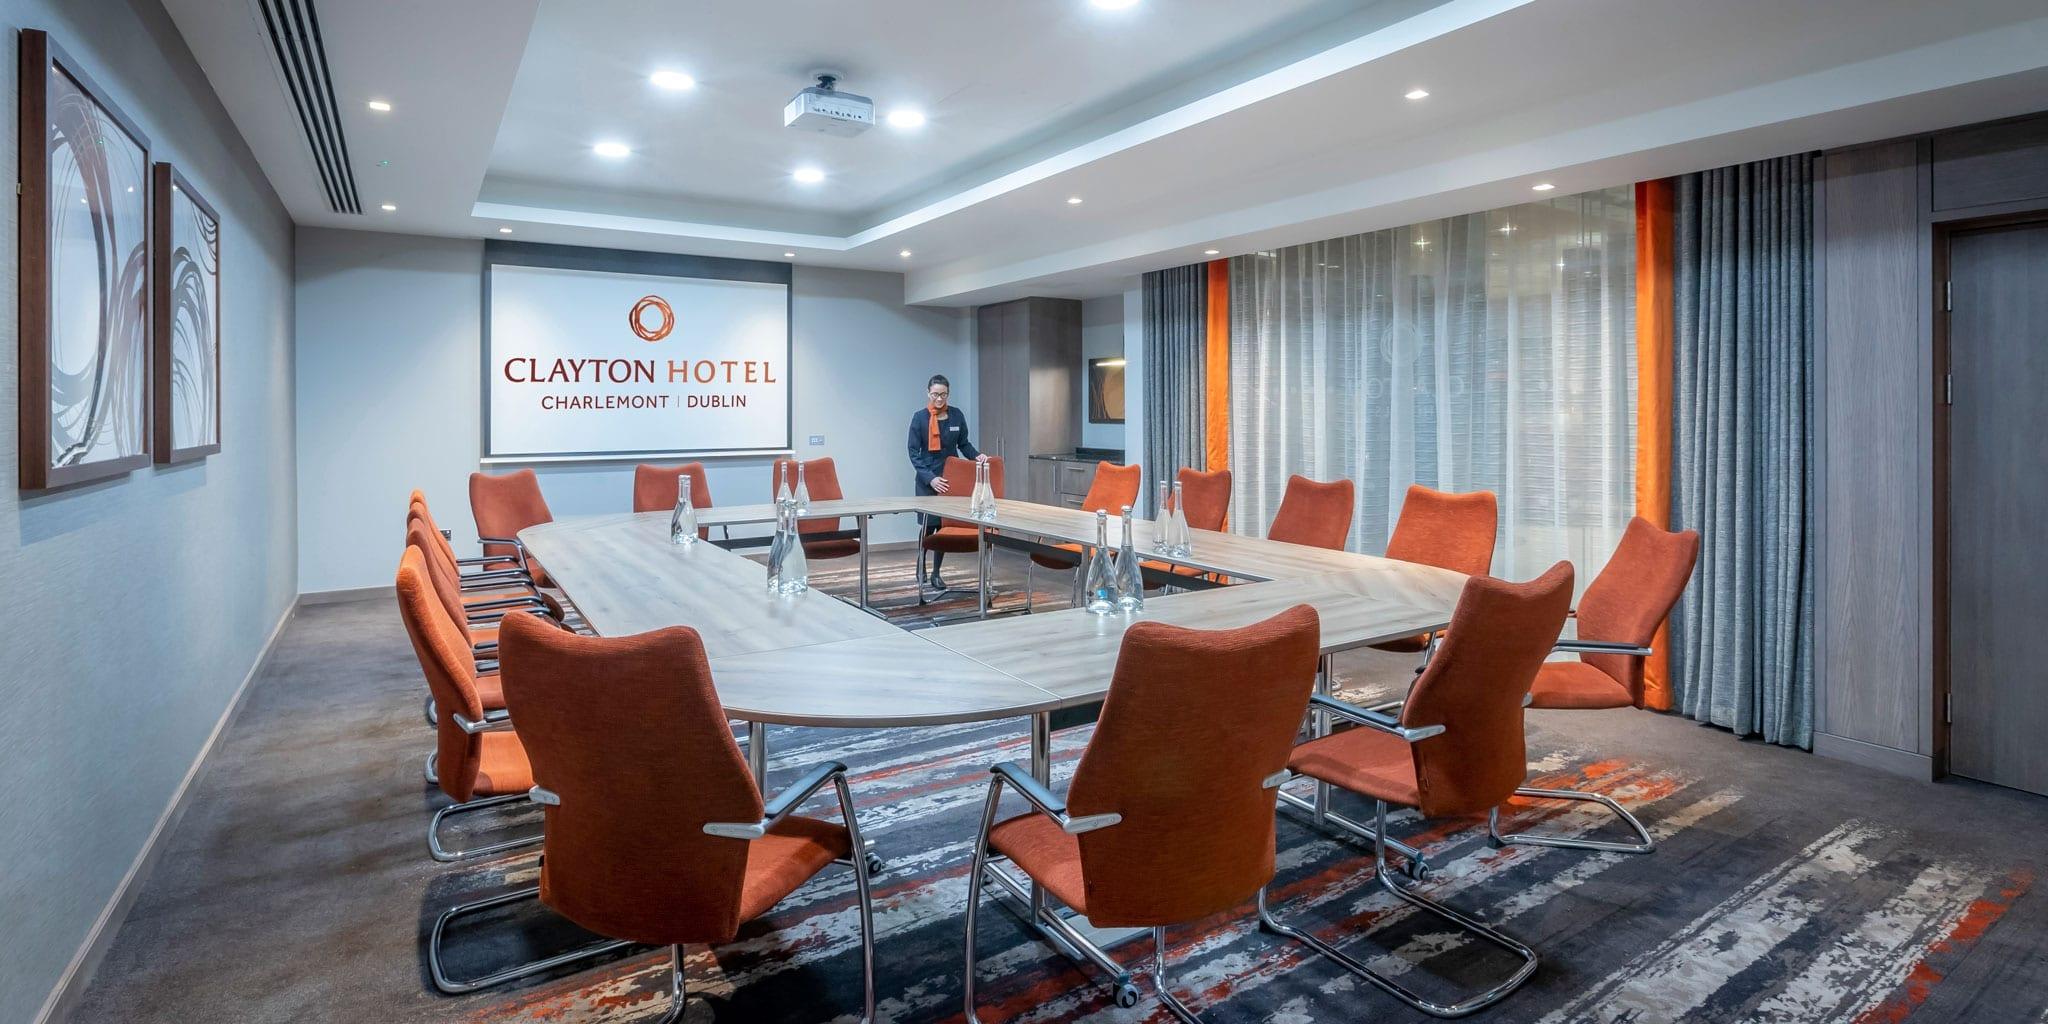 Synge-Suite-Clayton-Hotel-Charlemont